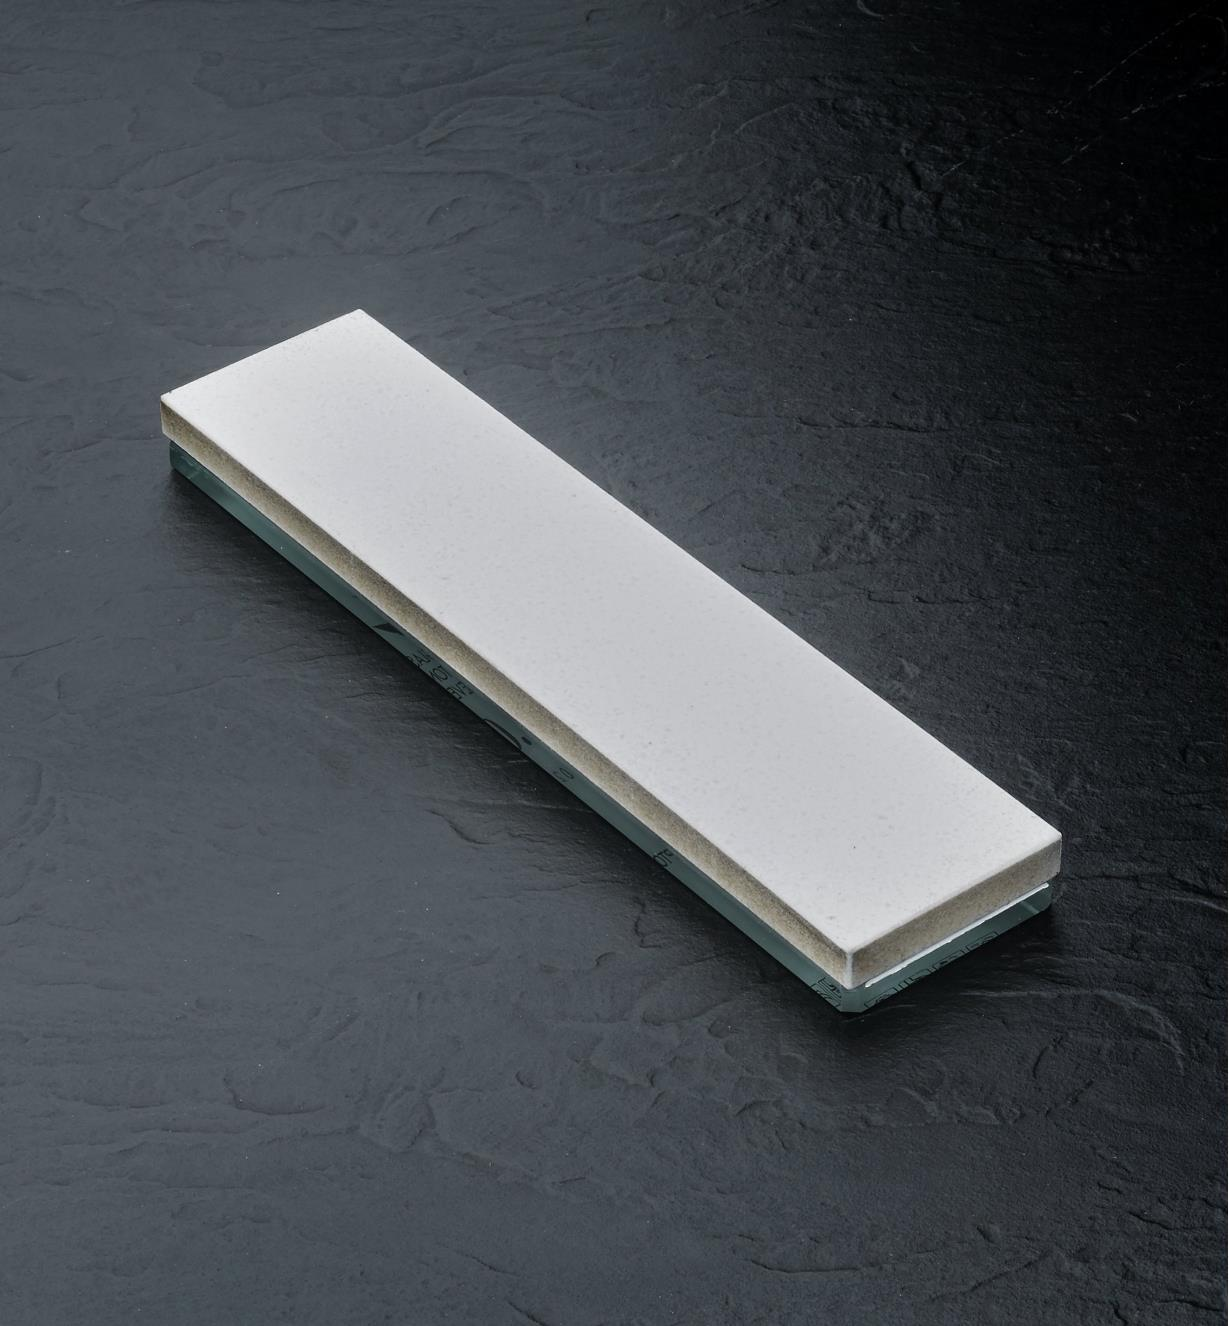 61M0201 - Shapton GS7 Stone 25.0µ